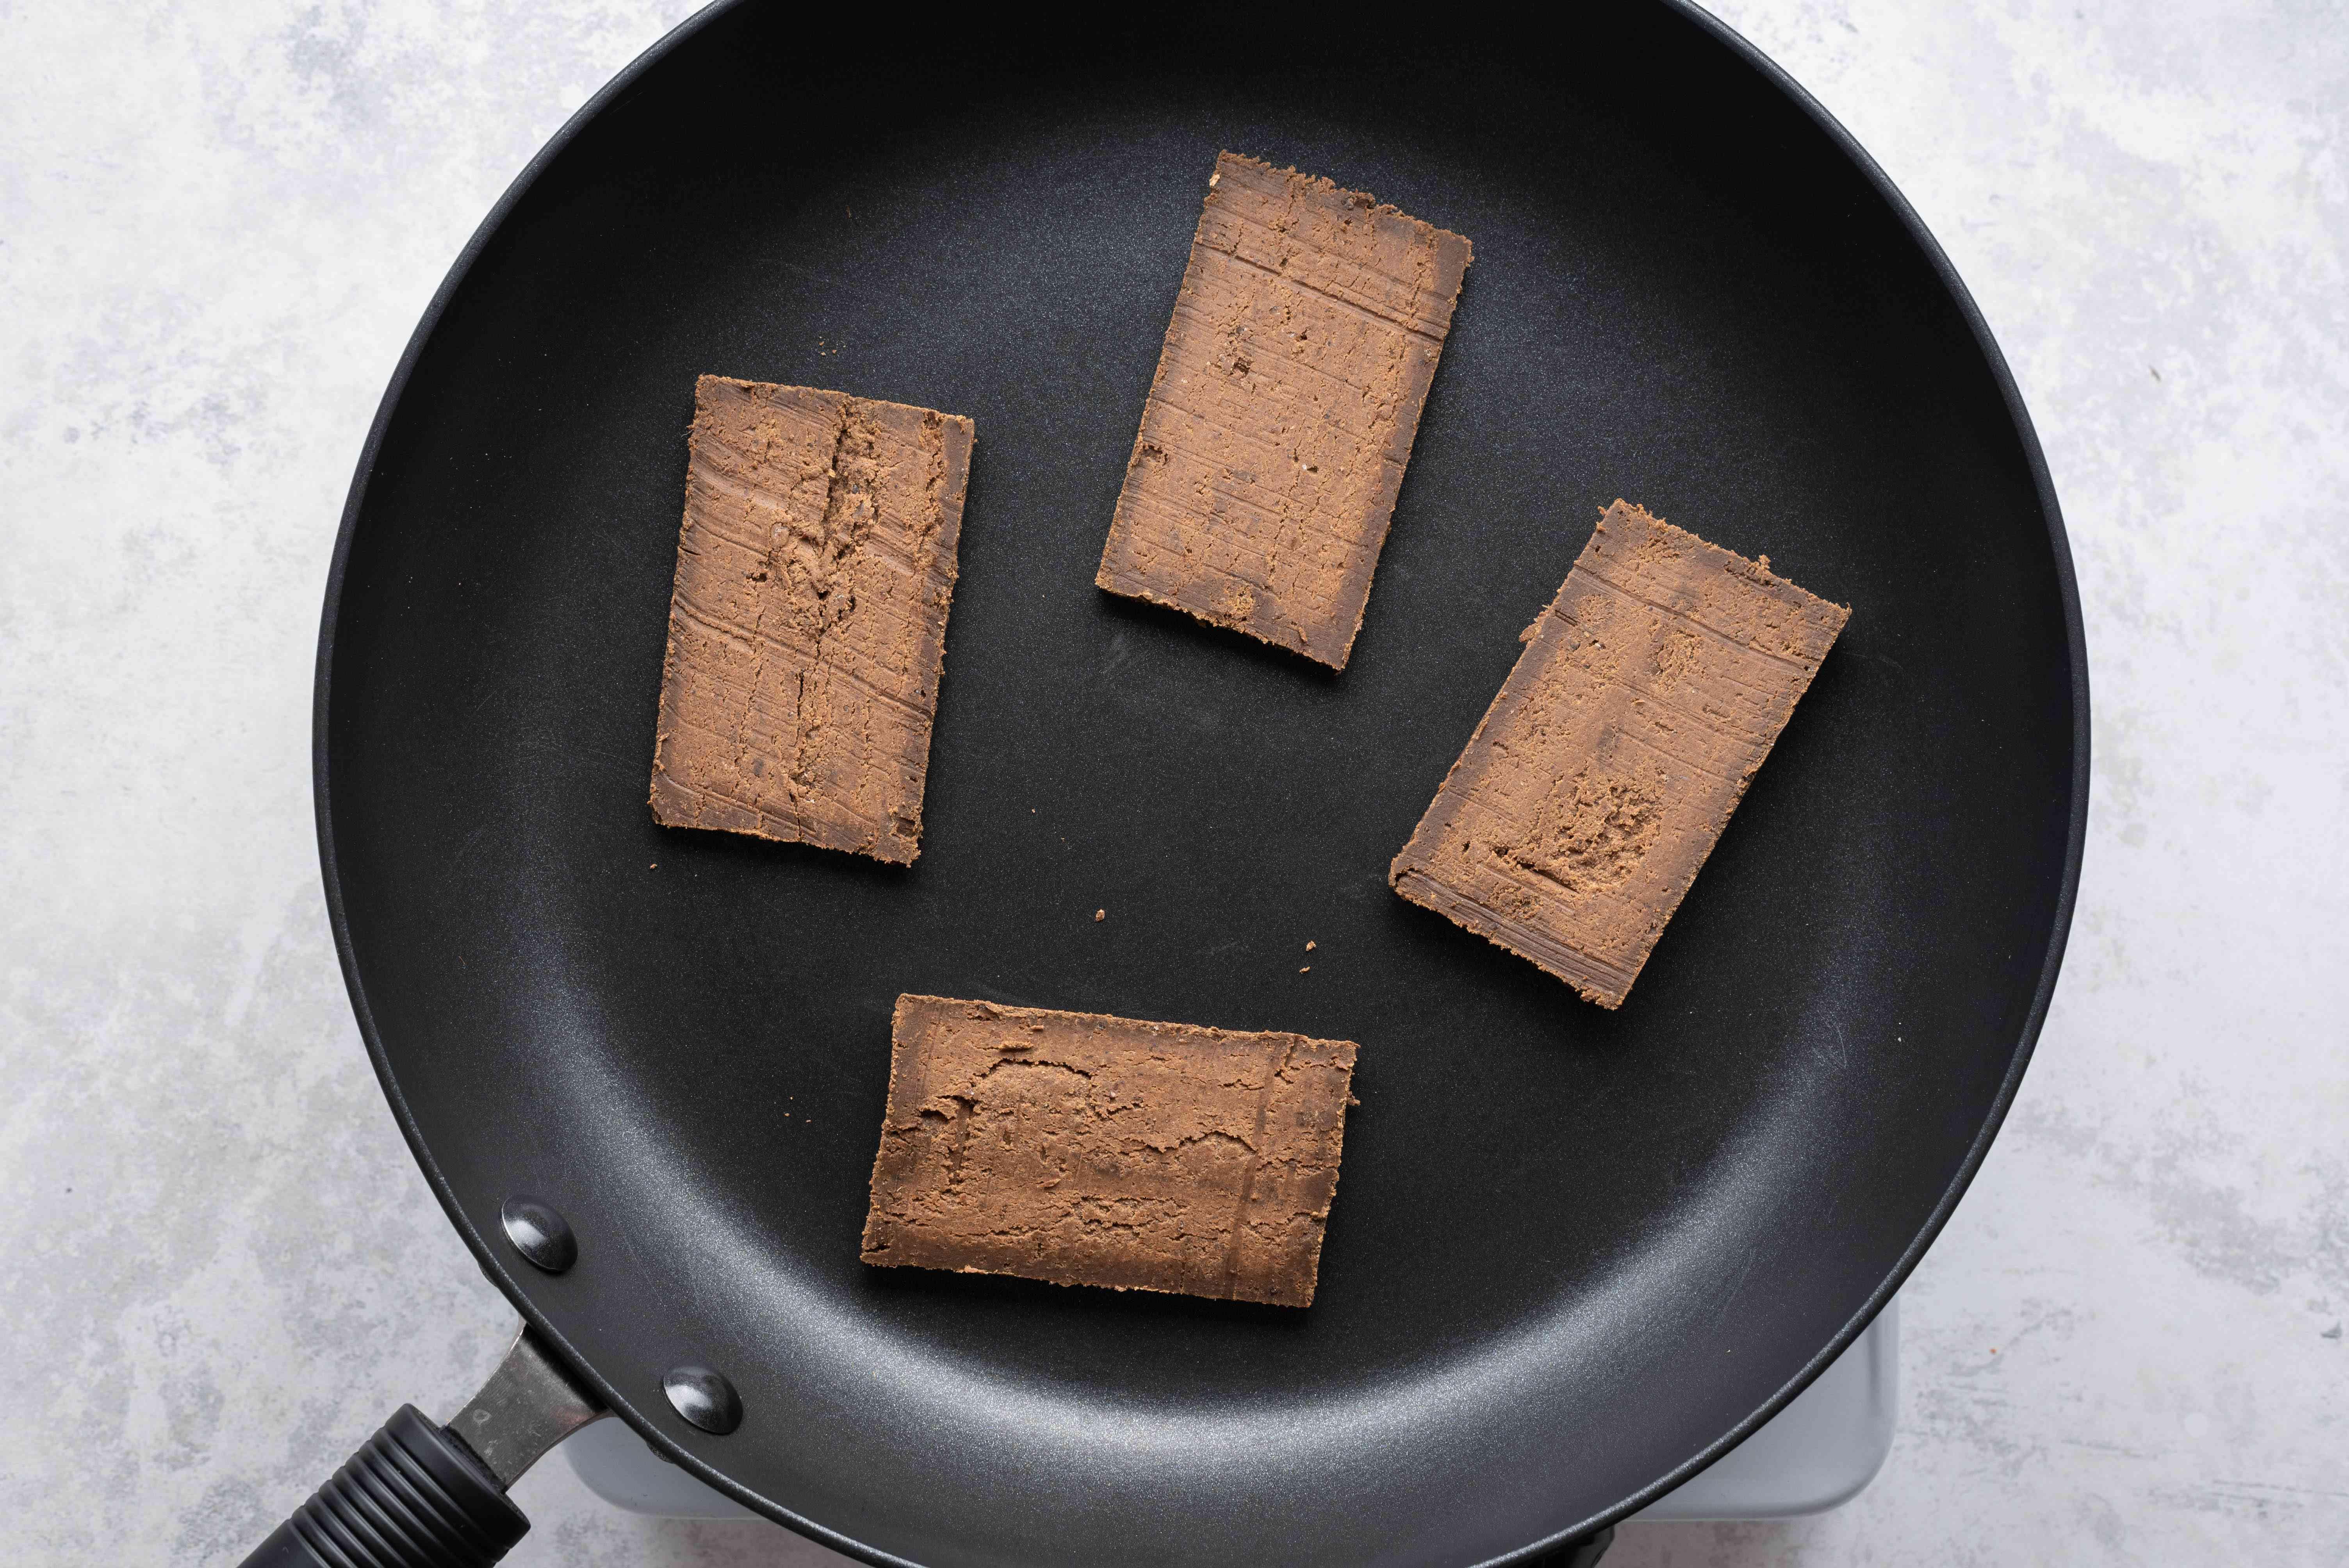 Belacan (Dried Shrimp Paste) in a pan